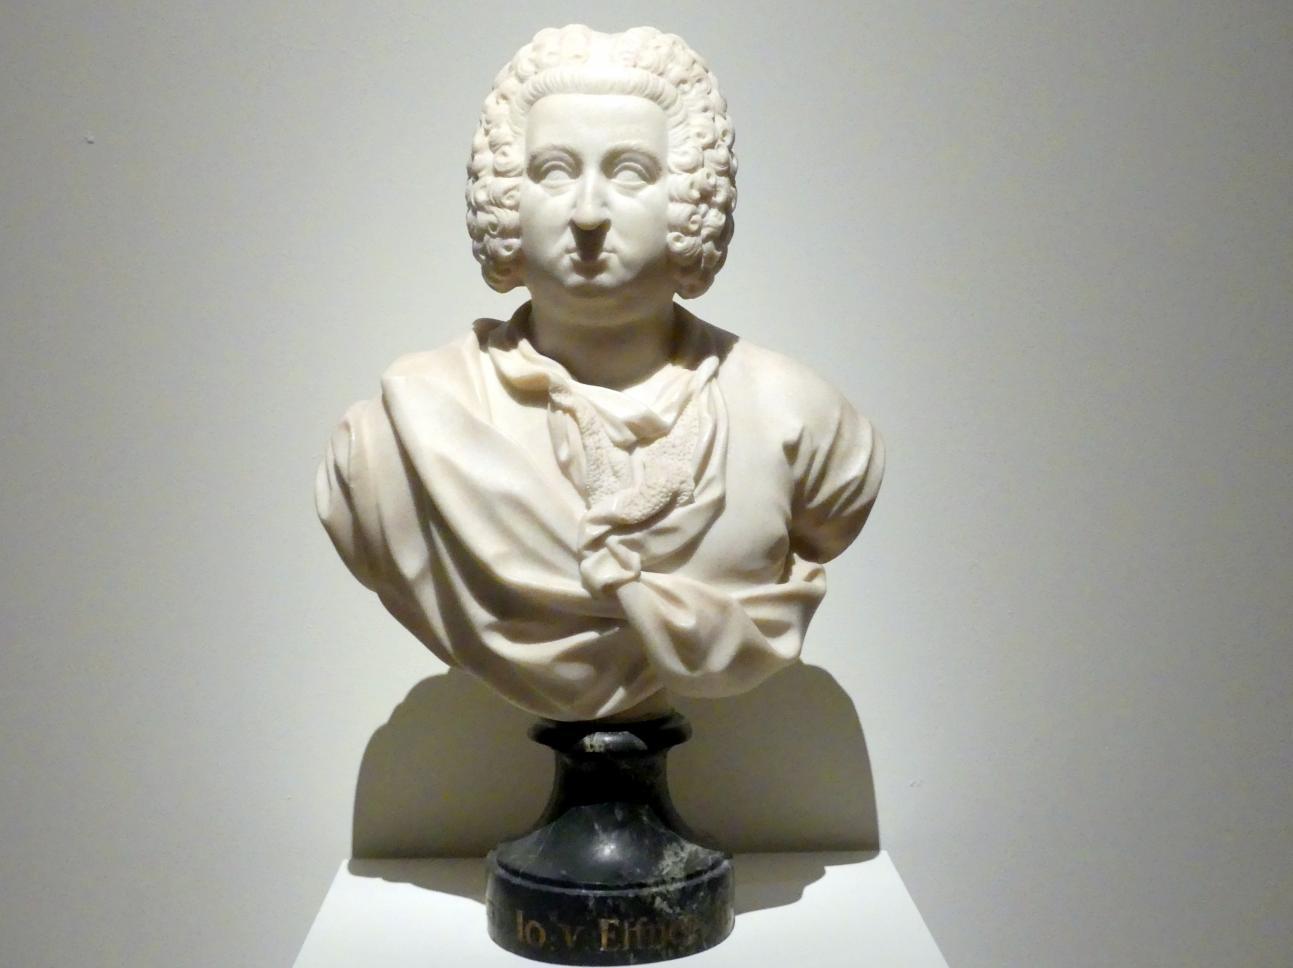 Charles de Groff: Joseph Effner, 1733